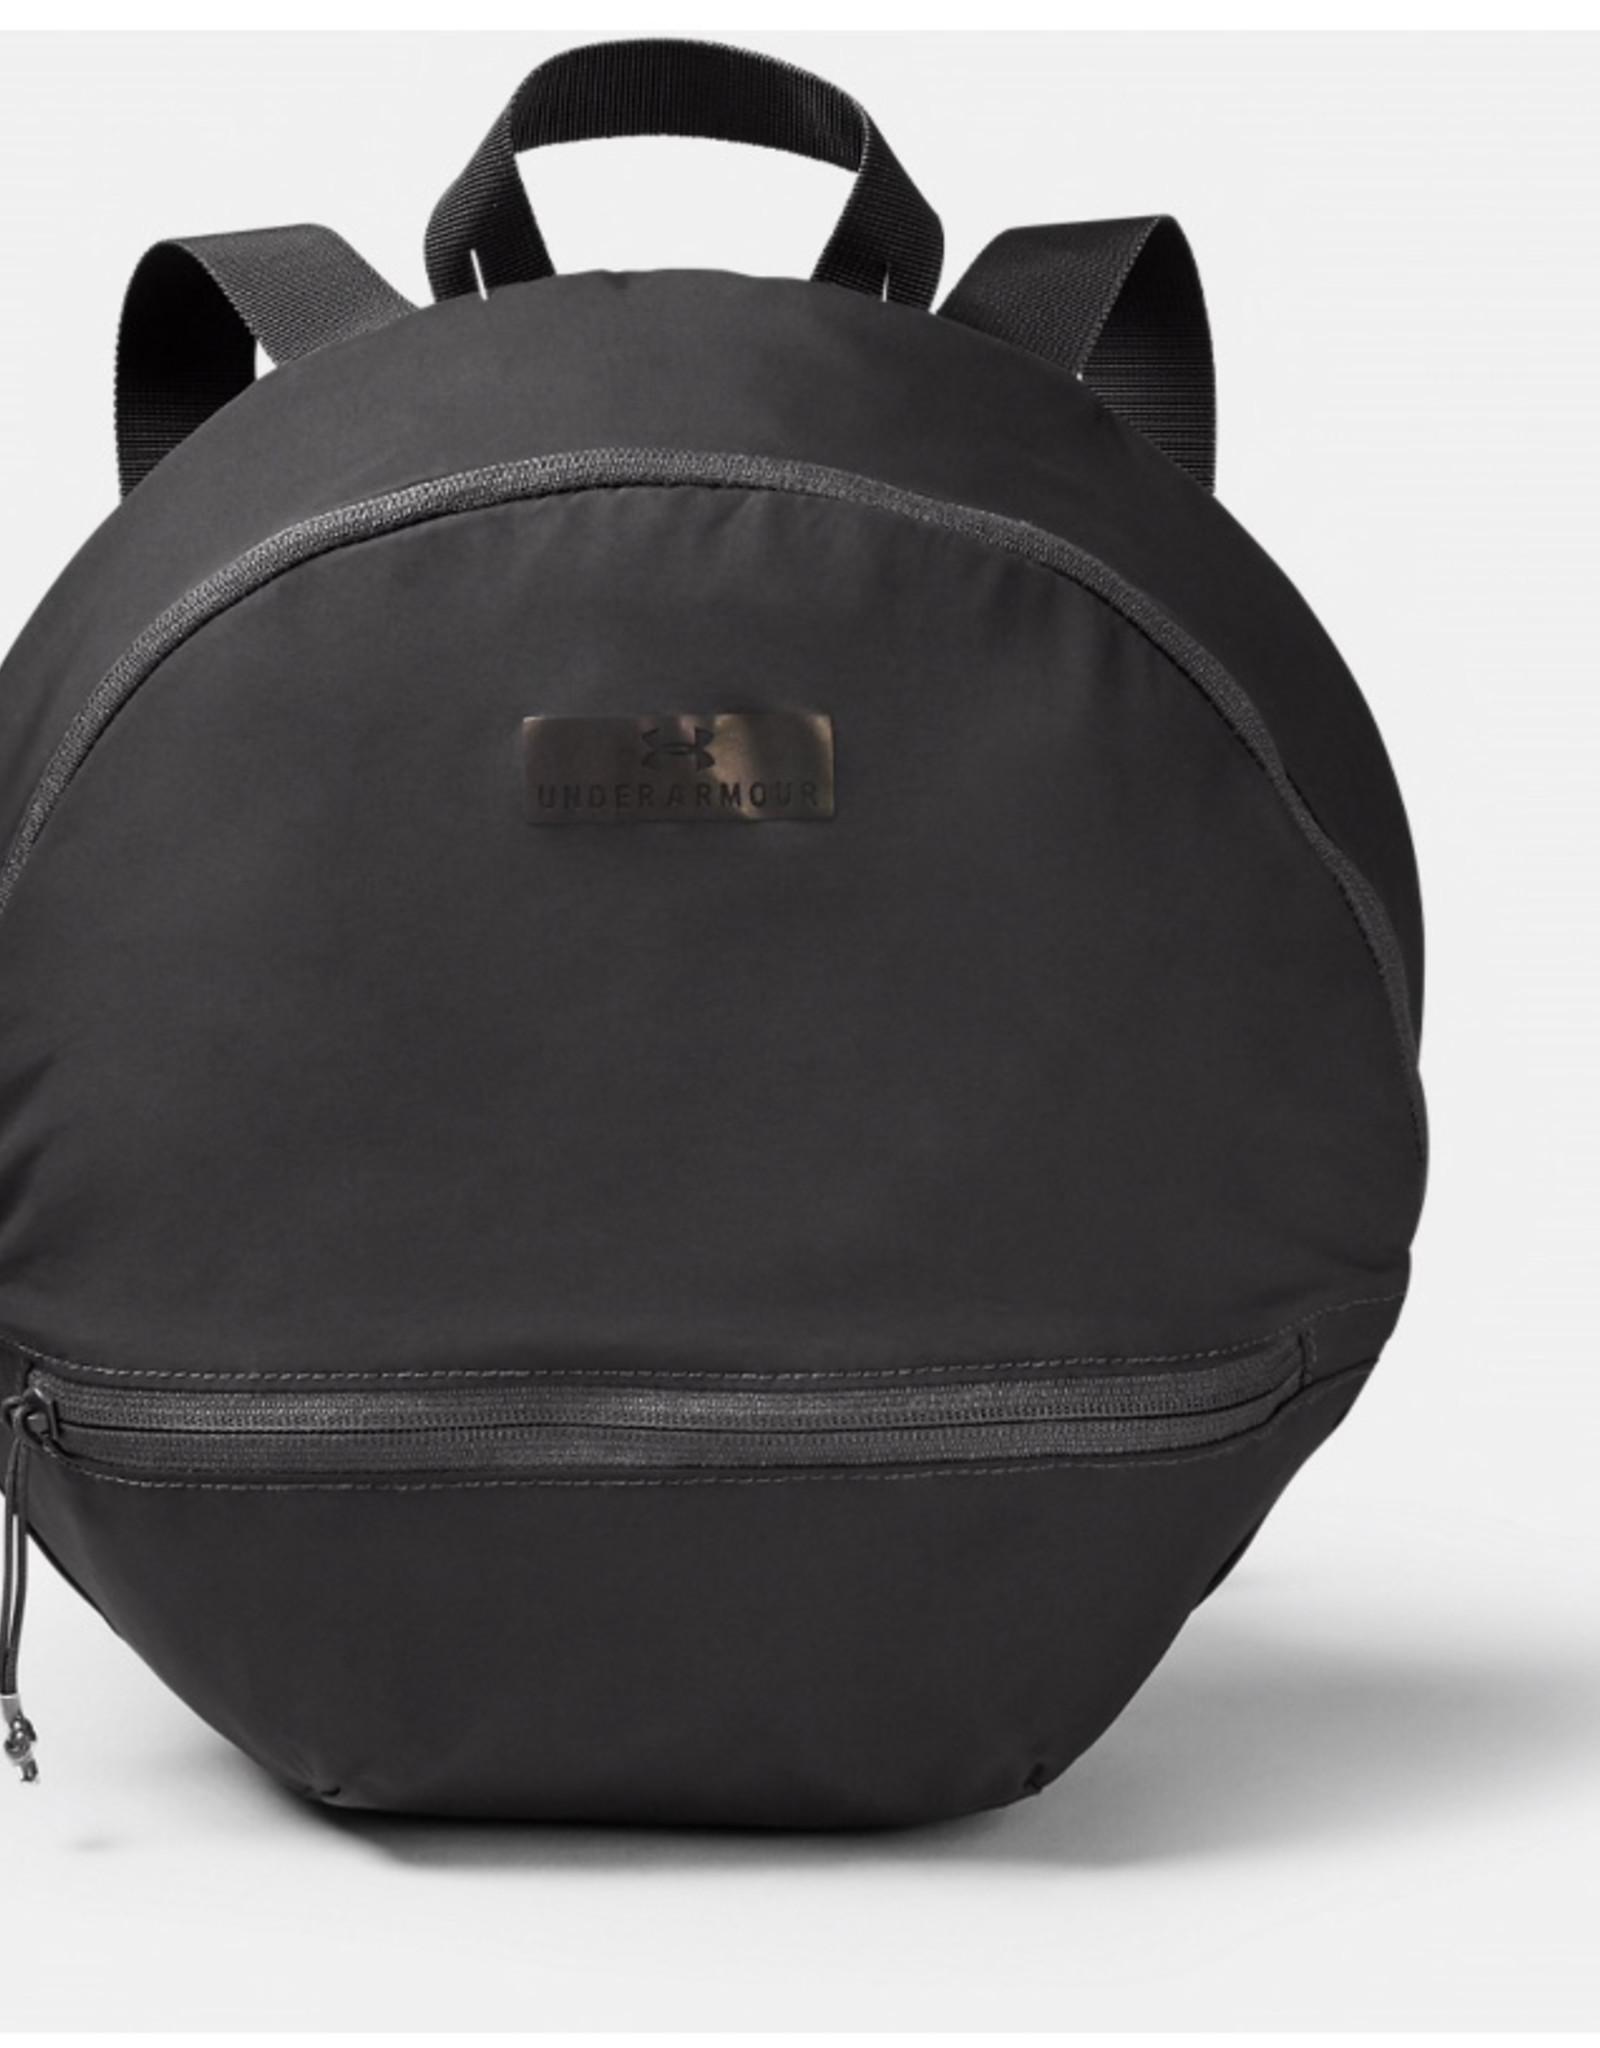 Under Armour UA Midi 2.0 Backpack-GRY-OSFA